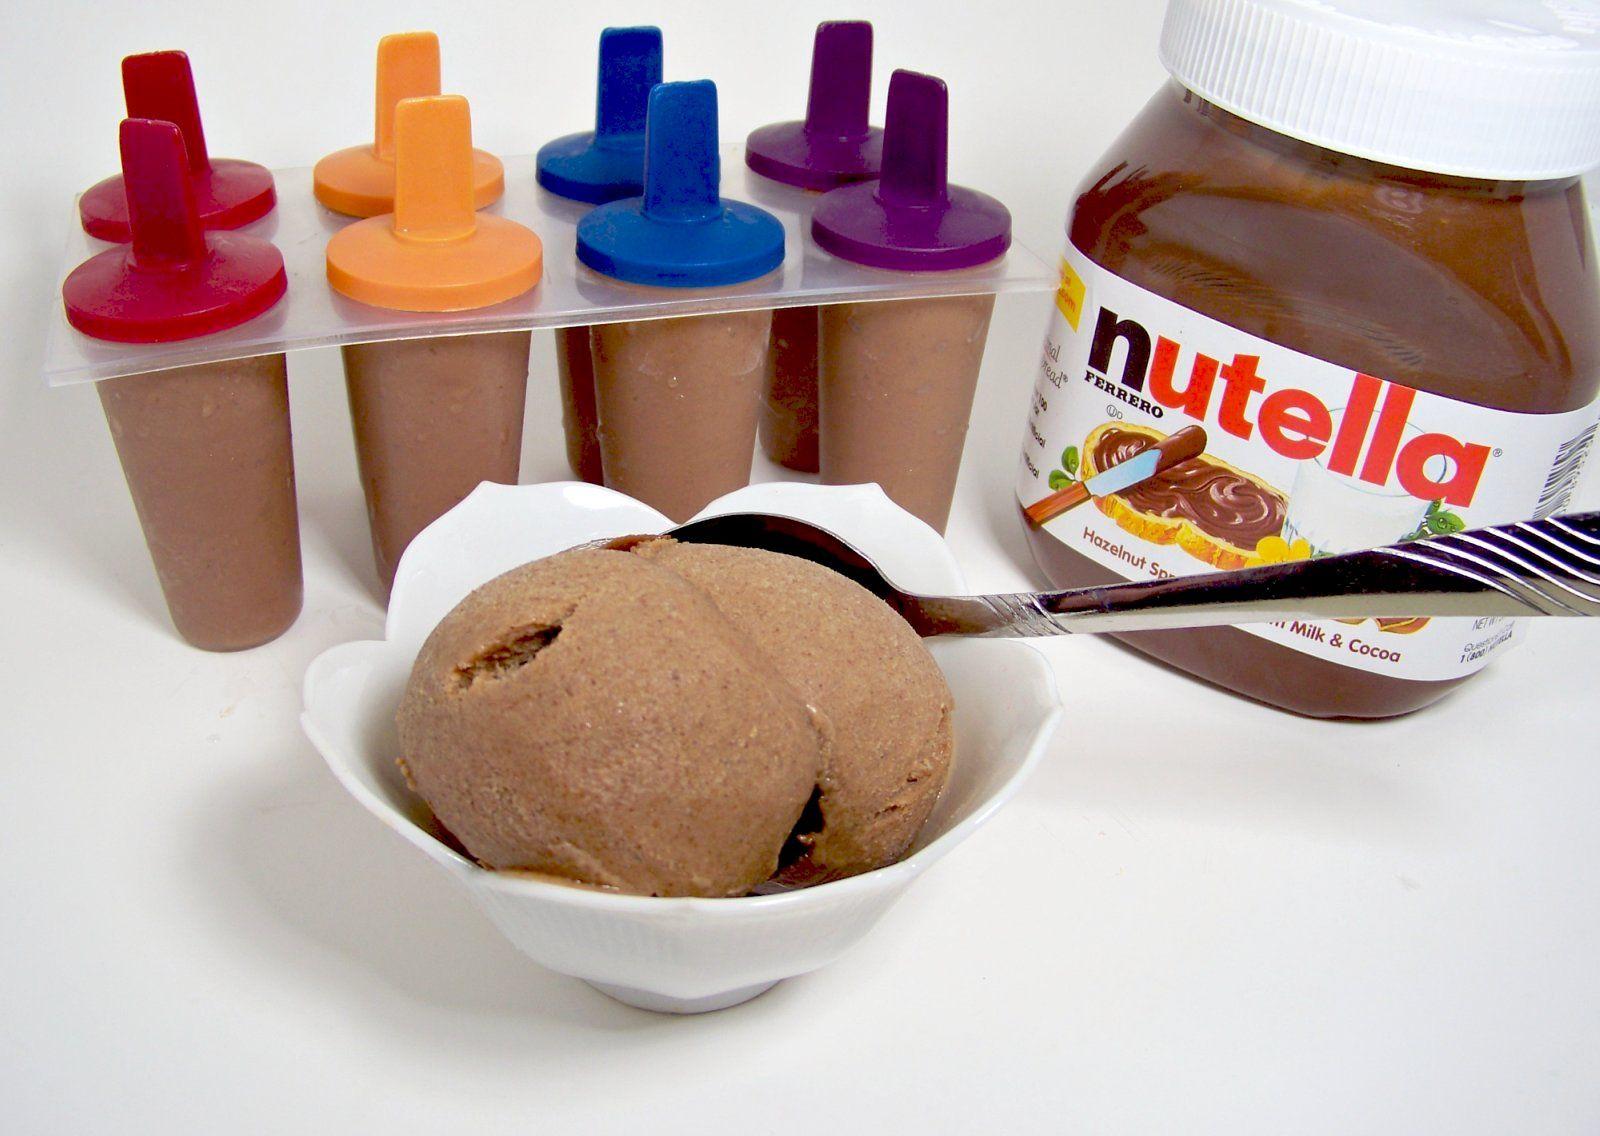 Nutella + banana + blender + freezer. omg.